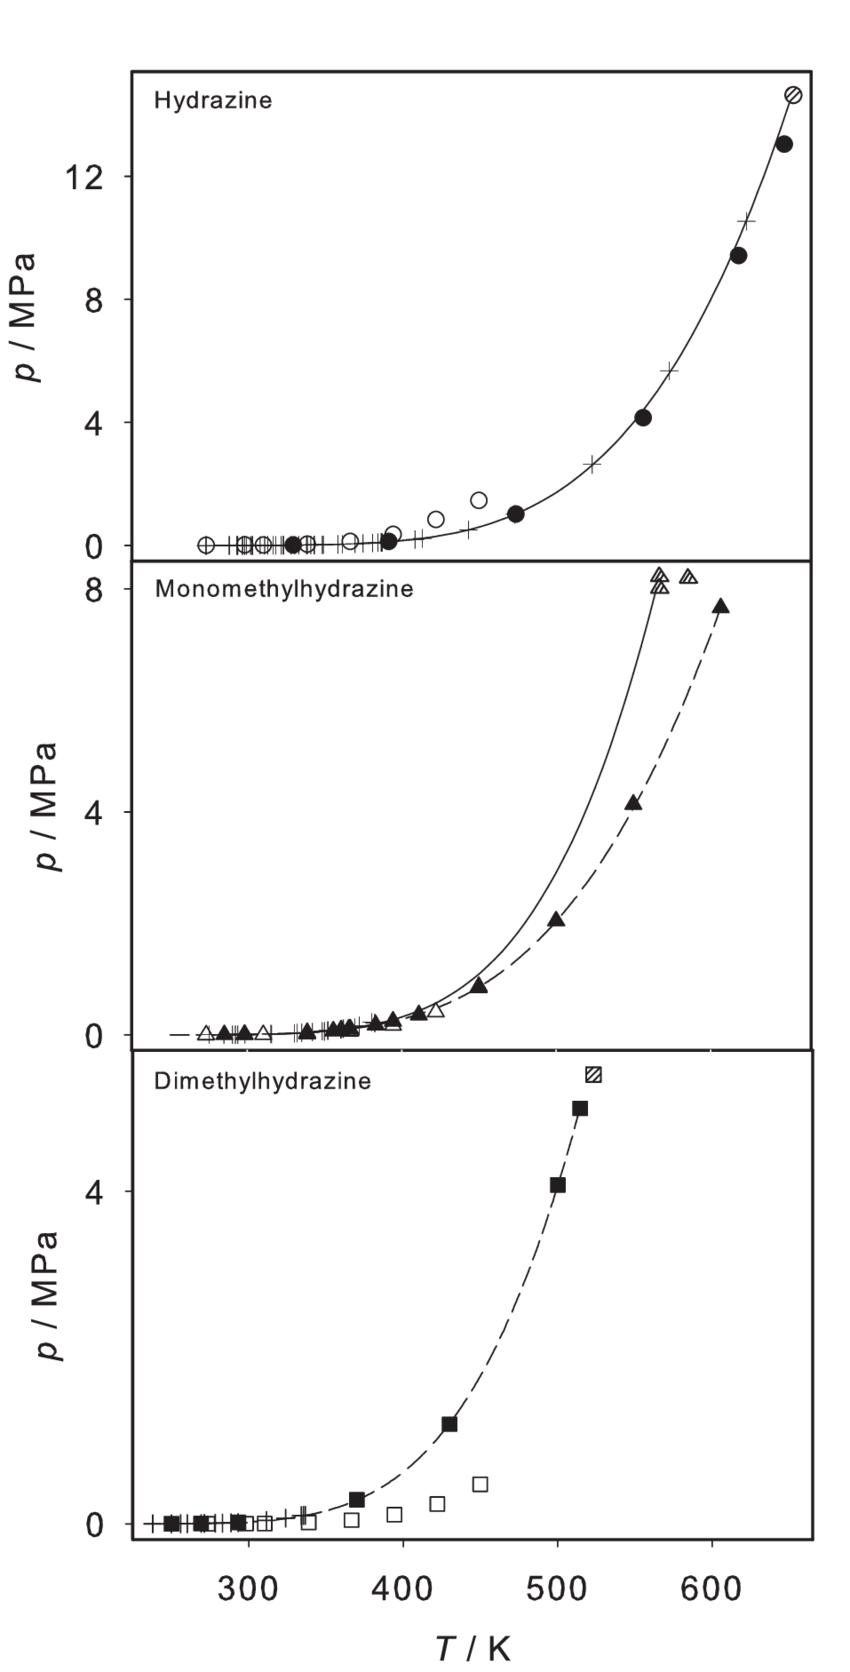 hight resolution of vapor pressure of hydrazine monomethylhydrazine and dimethylhydrazine